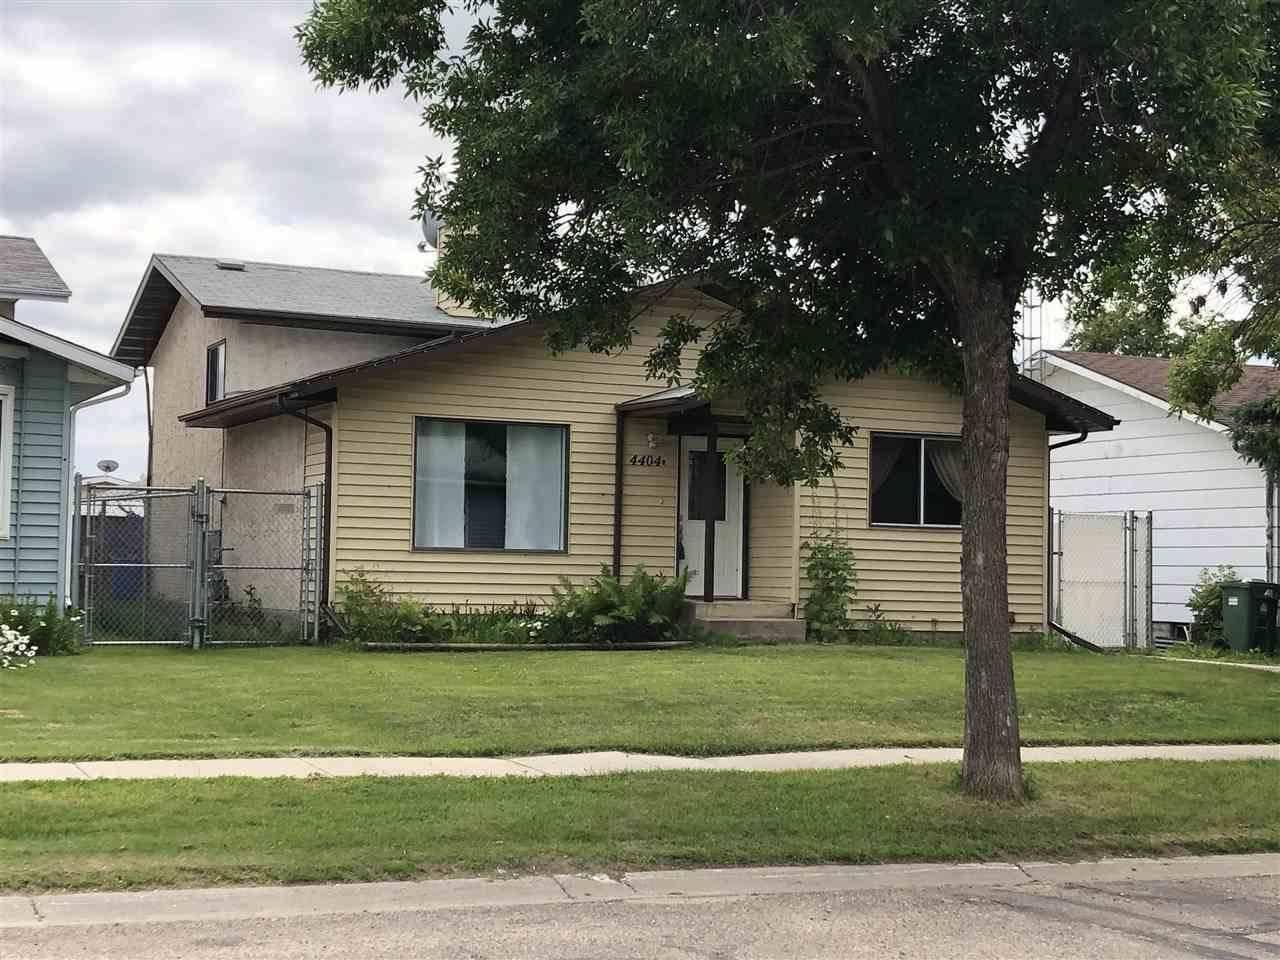 House for sale at  49 Ave Unit 4404w Bonnyville Town Alberta - MLS: E4151589